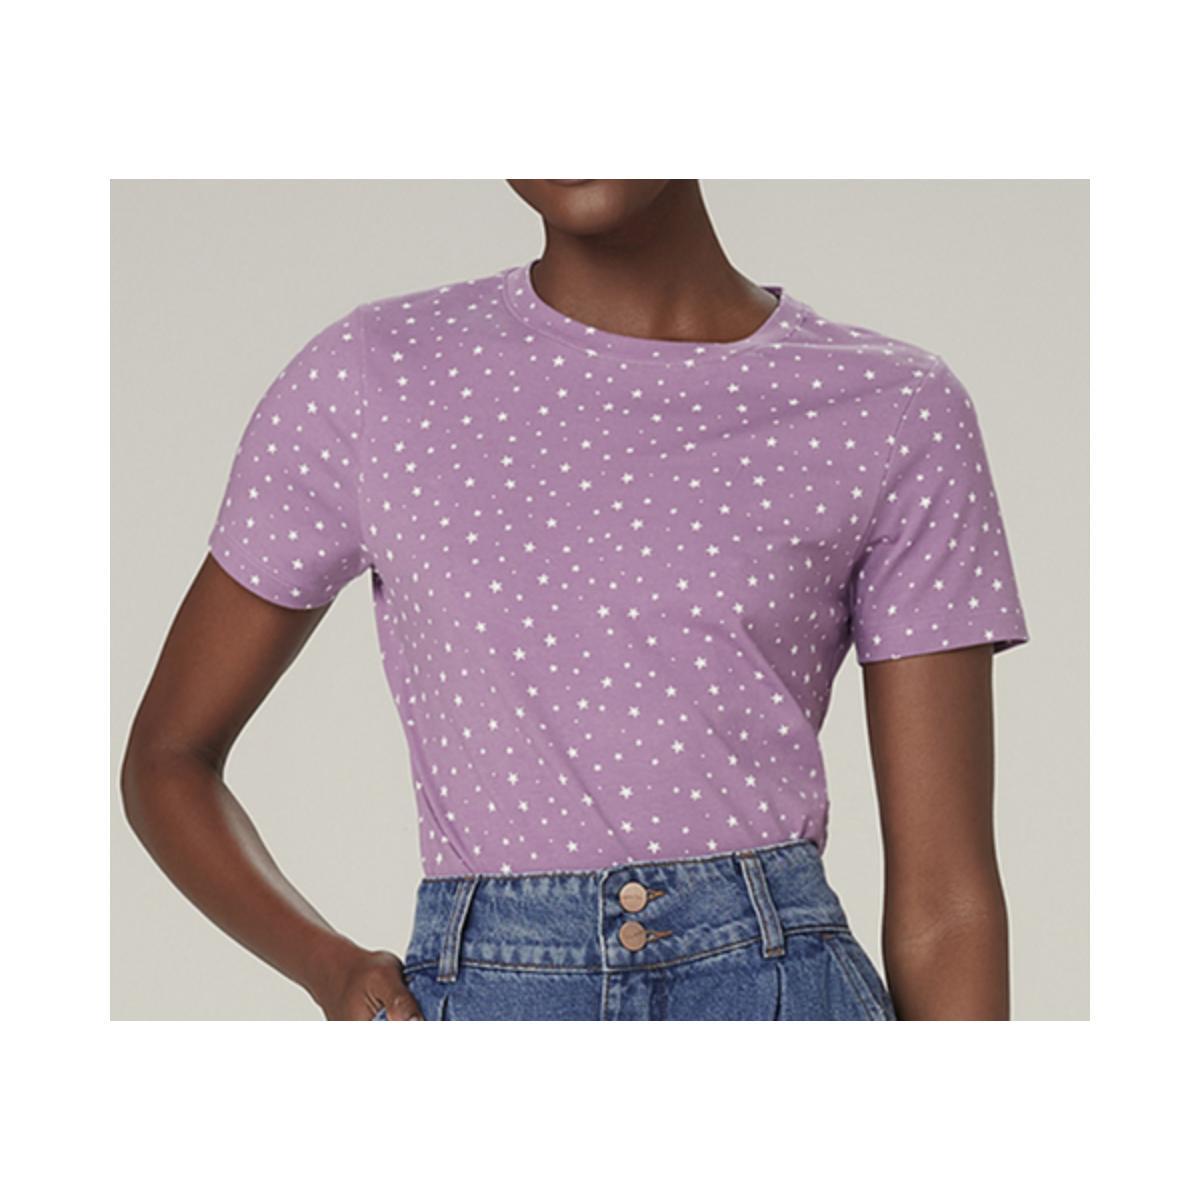 T-shirt Feminino Dzarm 6rz1 11en Roxo